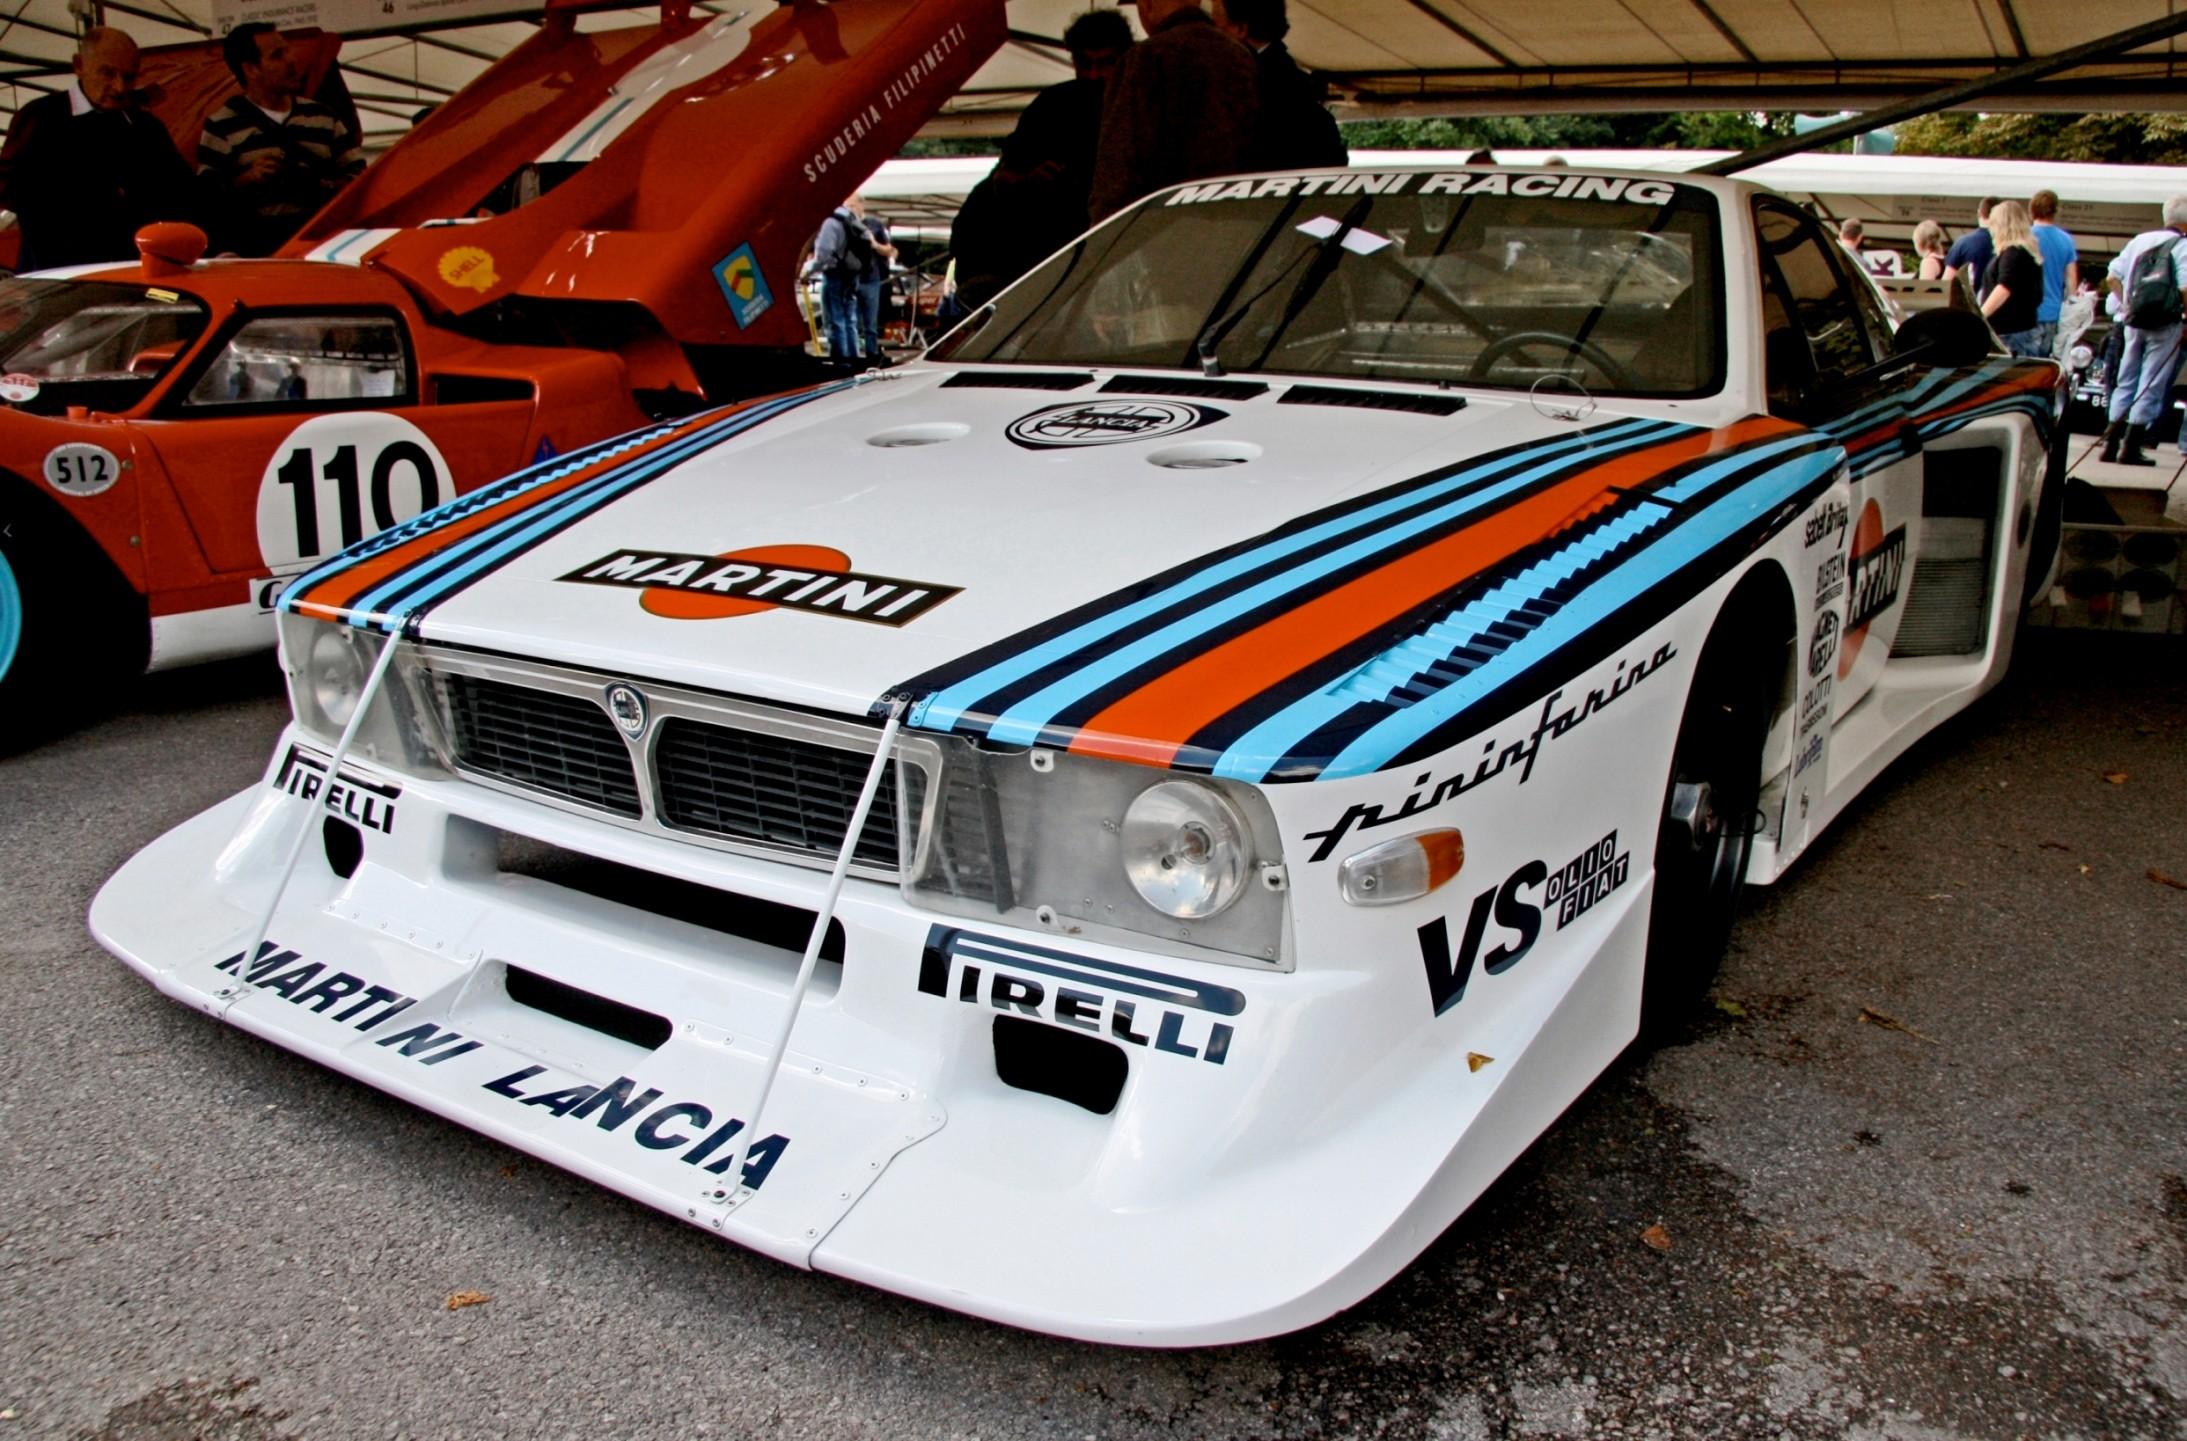 http://www.car-revs-daily.com/wp-content/uploads/Car-Revs-Daily.com-Rally-Legends-1983-Lancia-Beta-Montecarlo-and-1982-Lancia-037-at-Goodwood-2014-15.jpg